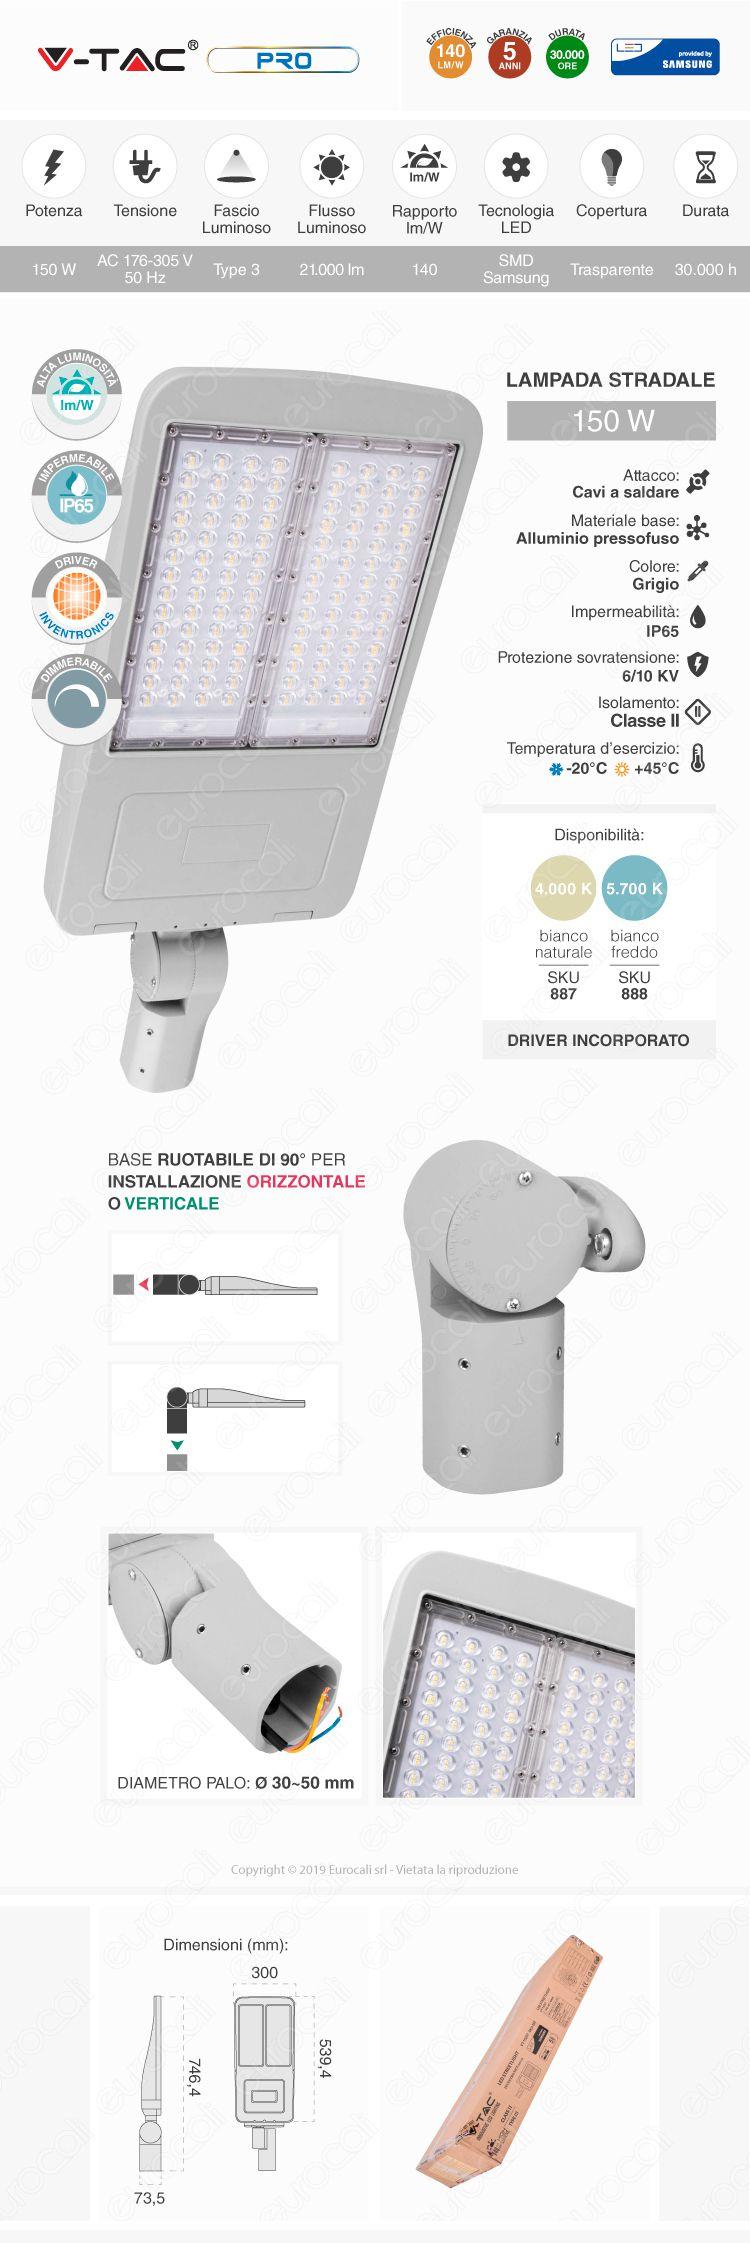 V-Tac SUPERPRO VT-200ST Lampada Stradale LED 200W Lampione SMD Chip Samsung Fascio Luminoso Type 3M